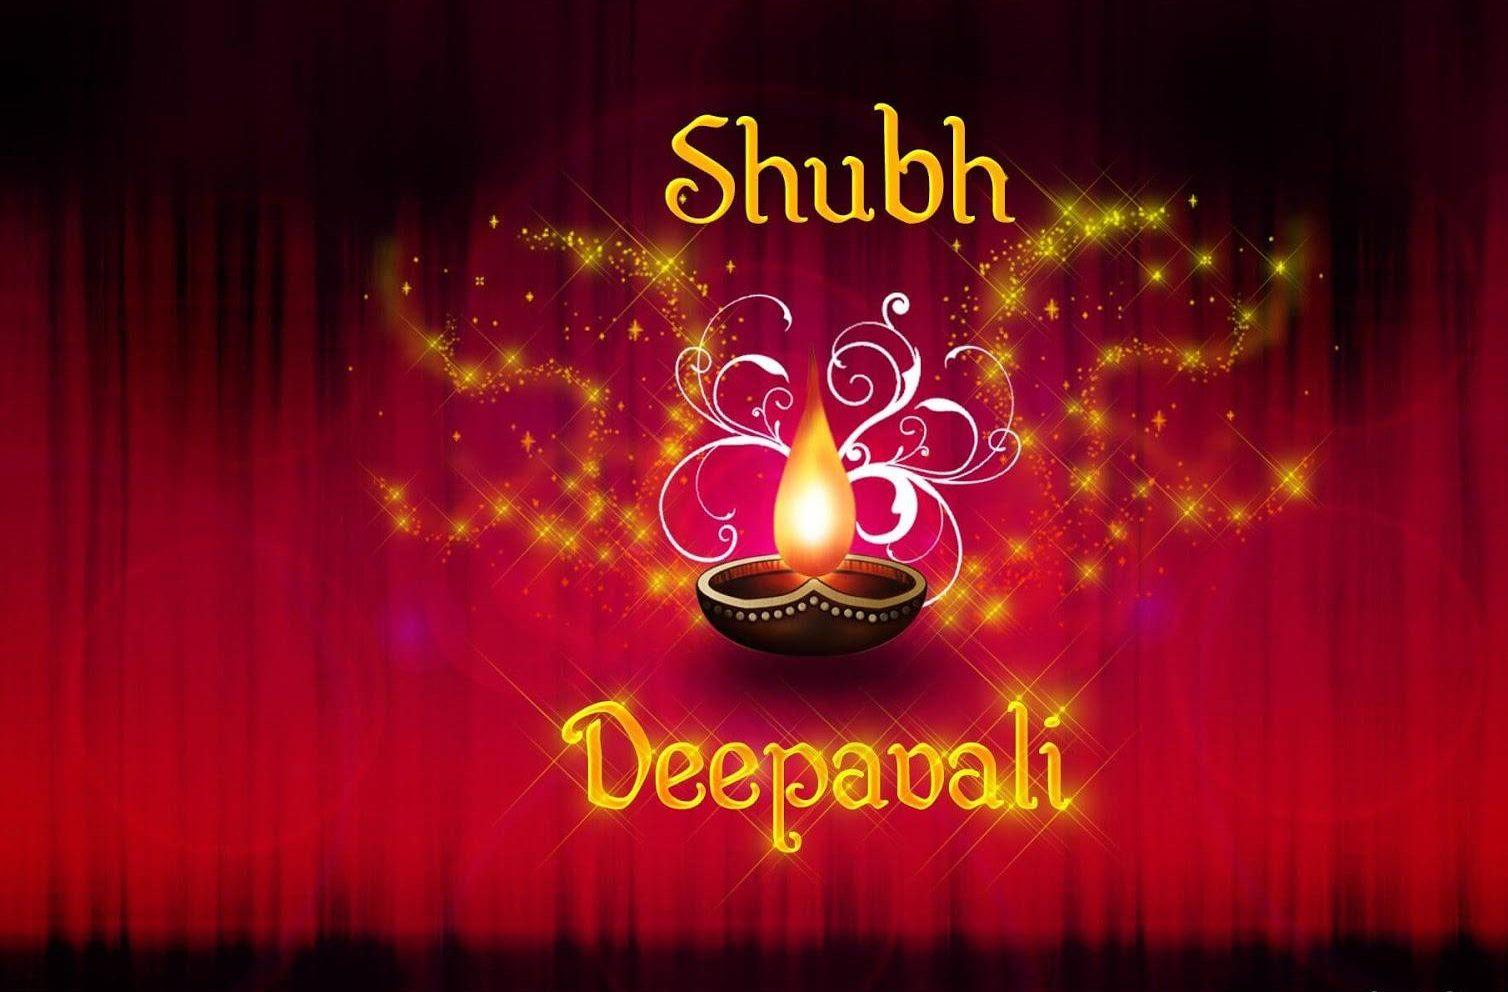 Diwali 2016 diwali quotes quotes for diwali diwali messages diwali 2016 diwali quotes quotes for diwali diwali messages m4hsunfo